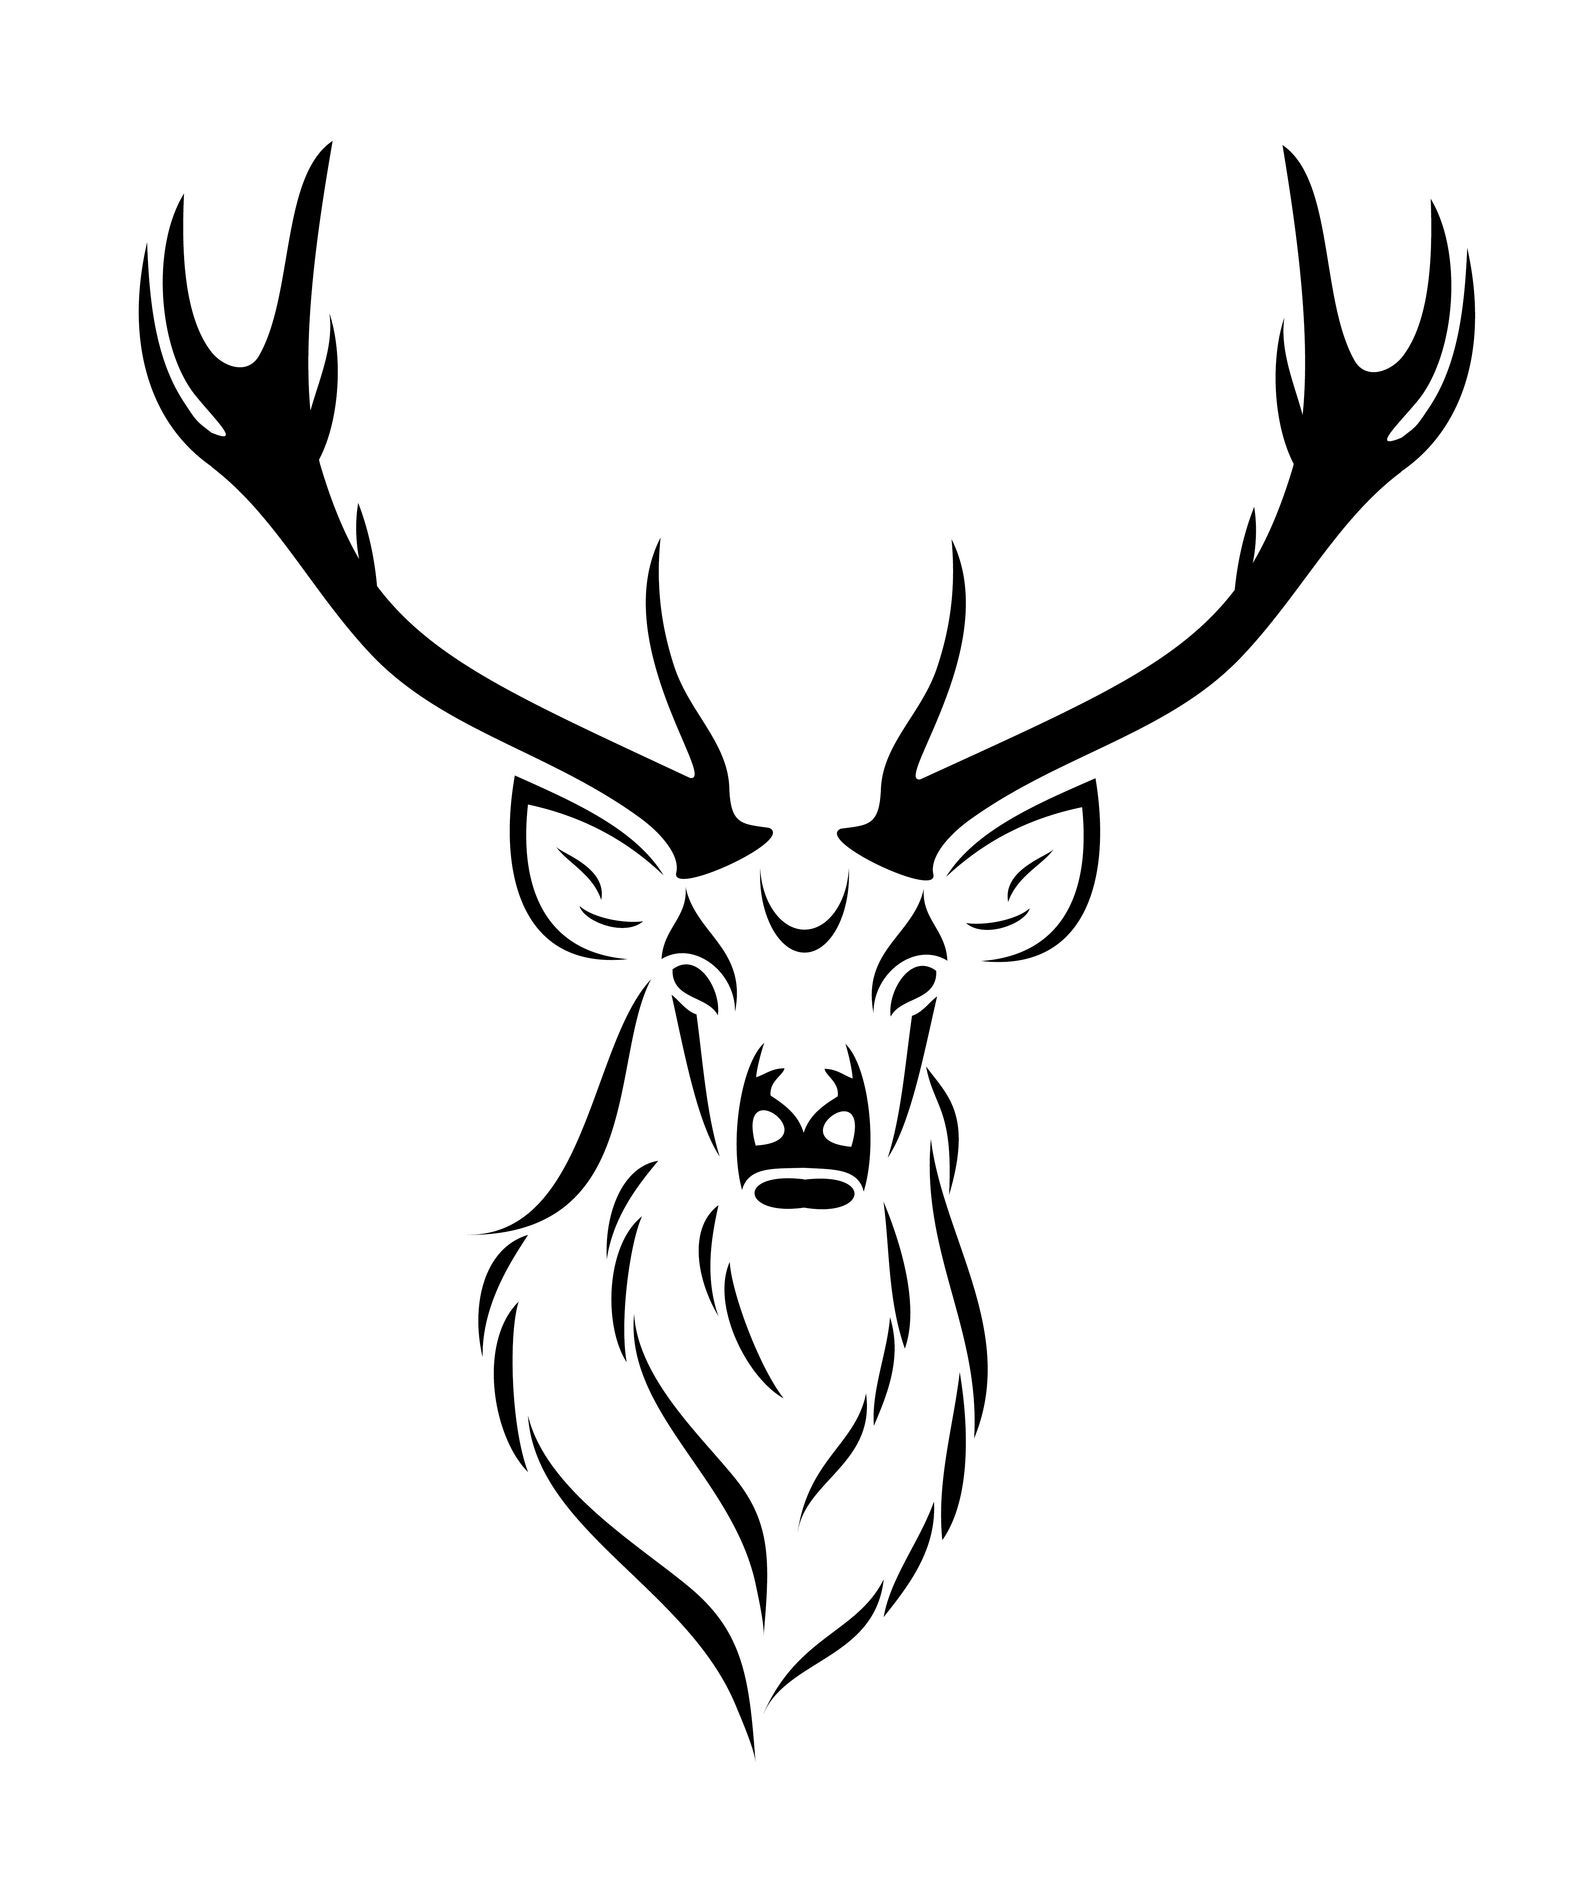 1581x1897 Deer Tattoos + Meaning Jewelry Designs Deer Tattoo